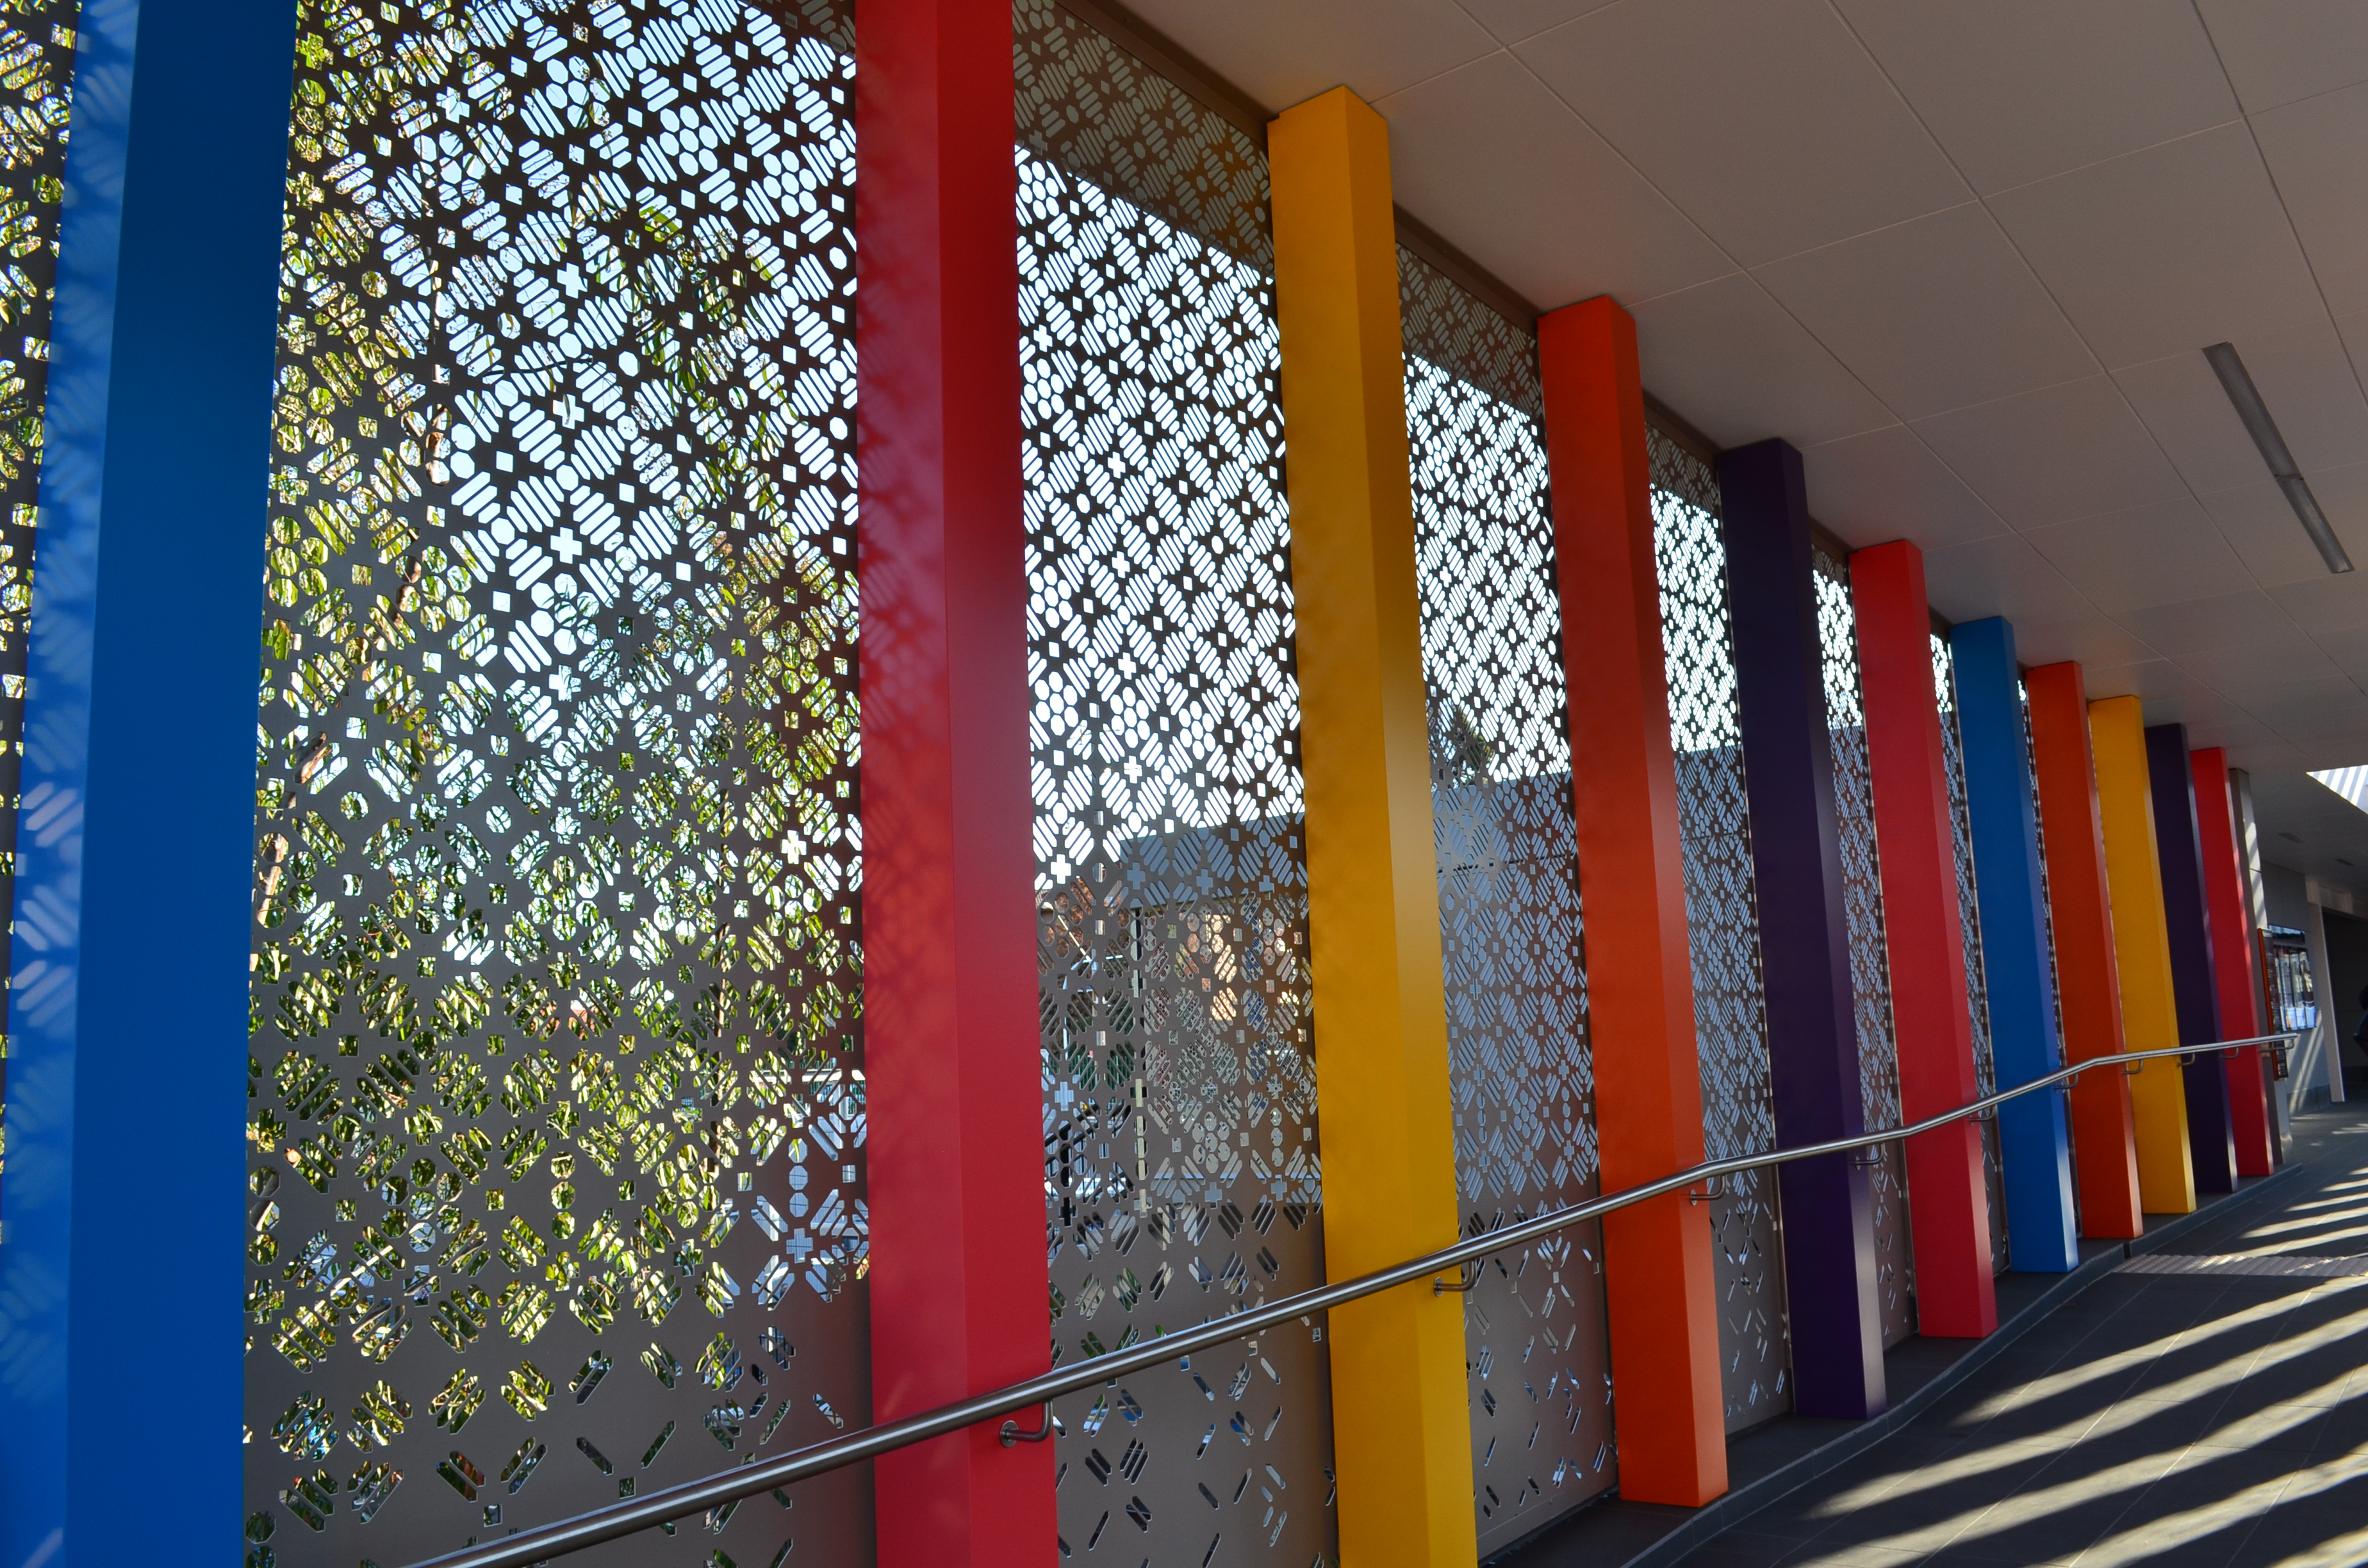 Bespoke perforated metal design -Harris Park Station